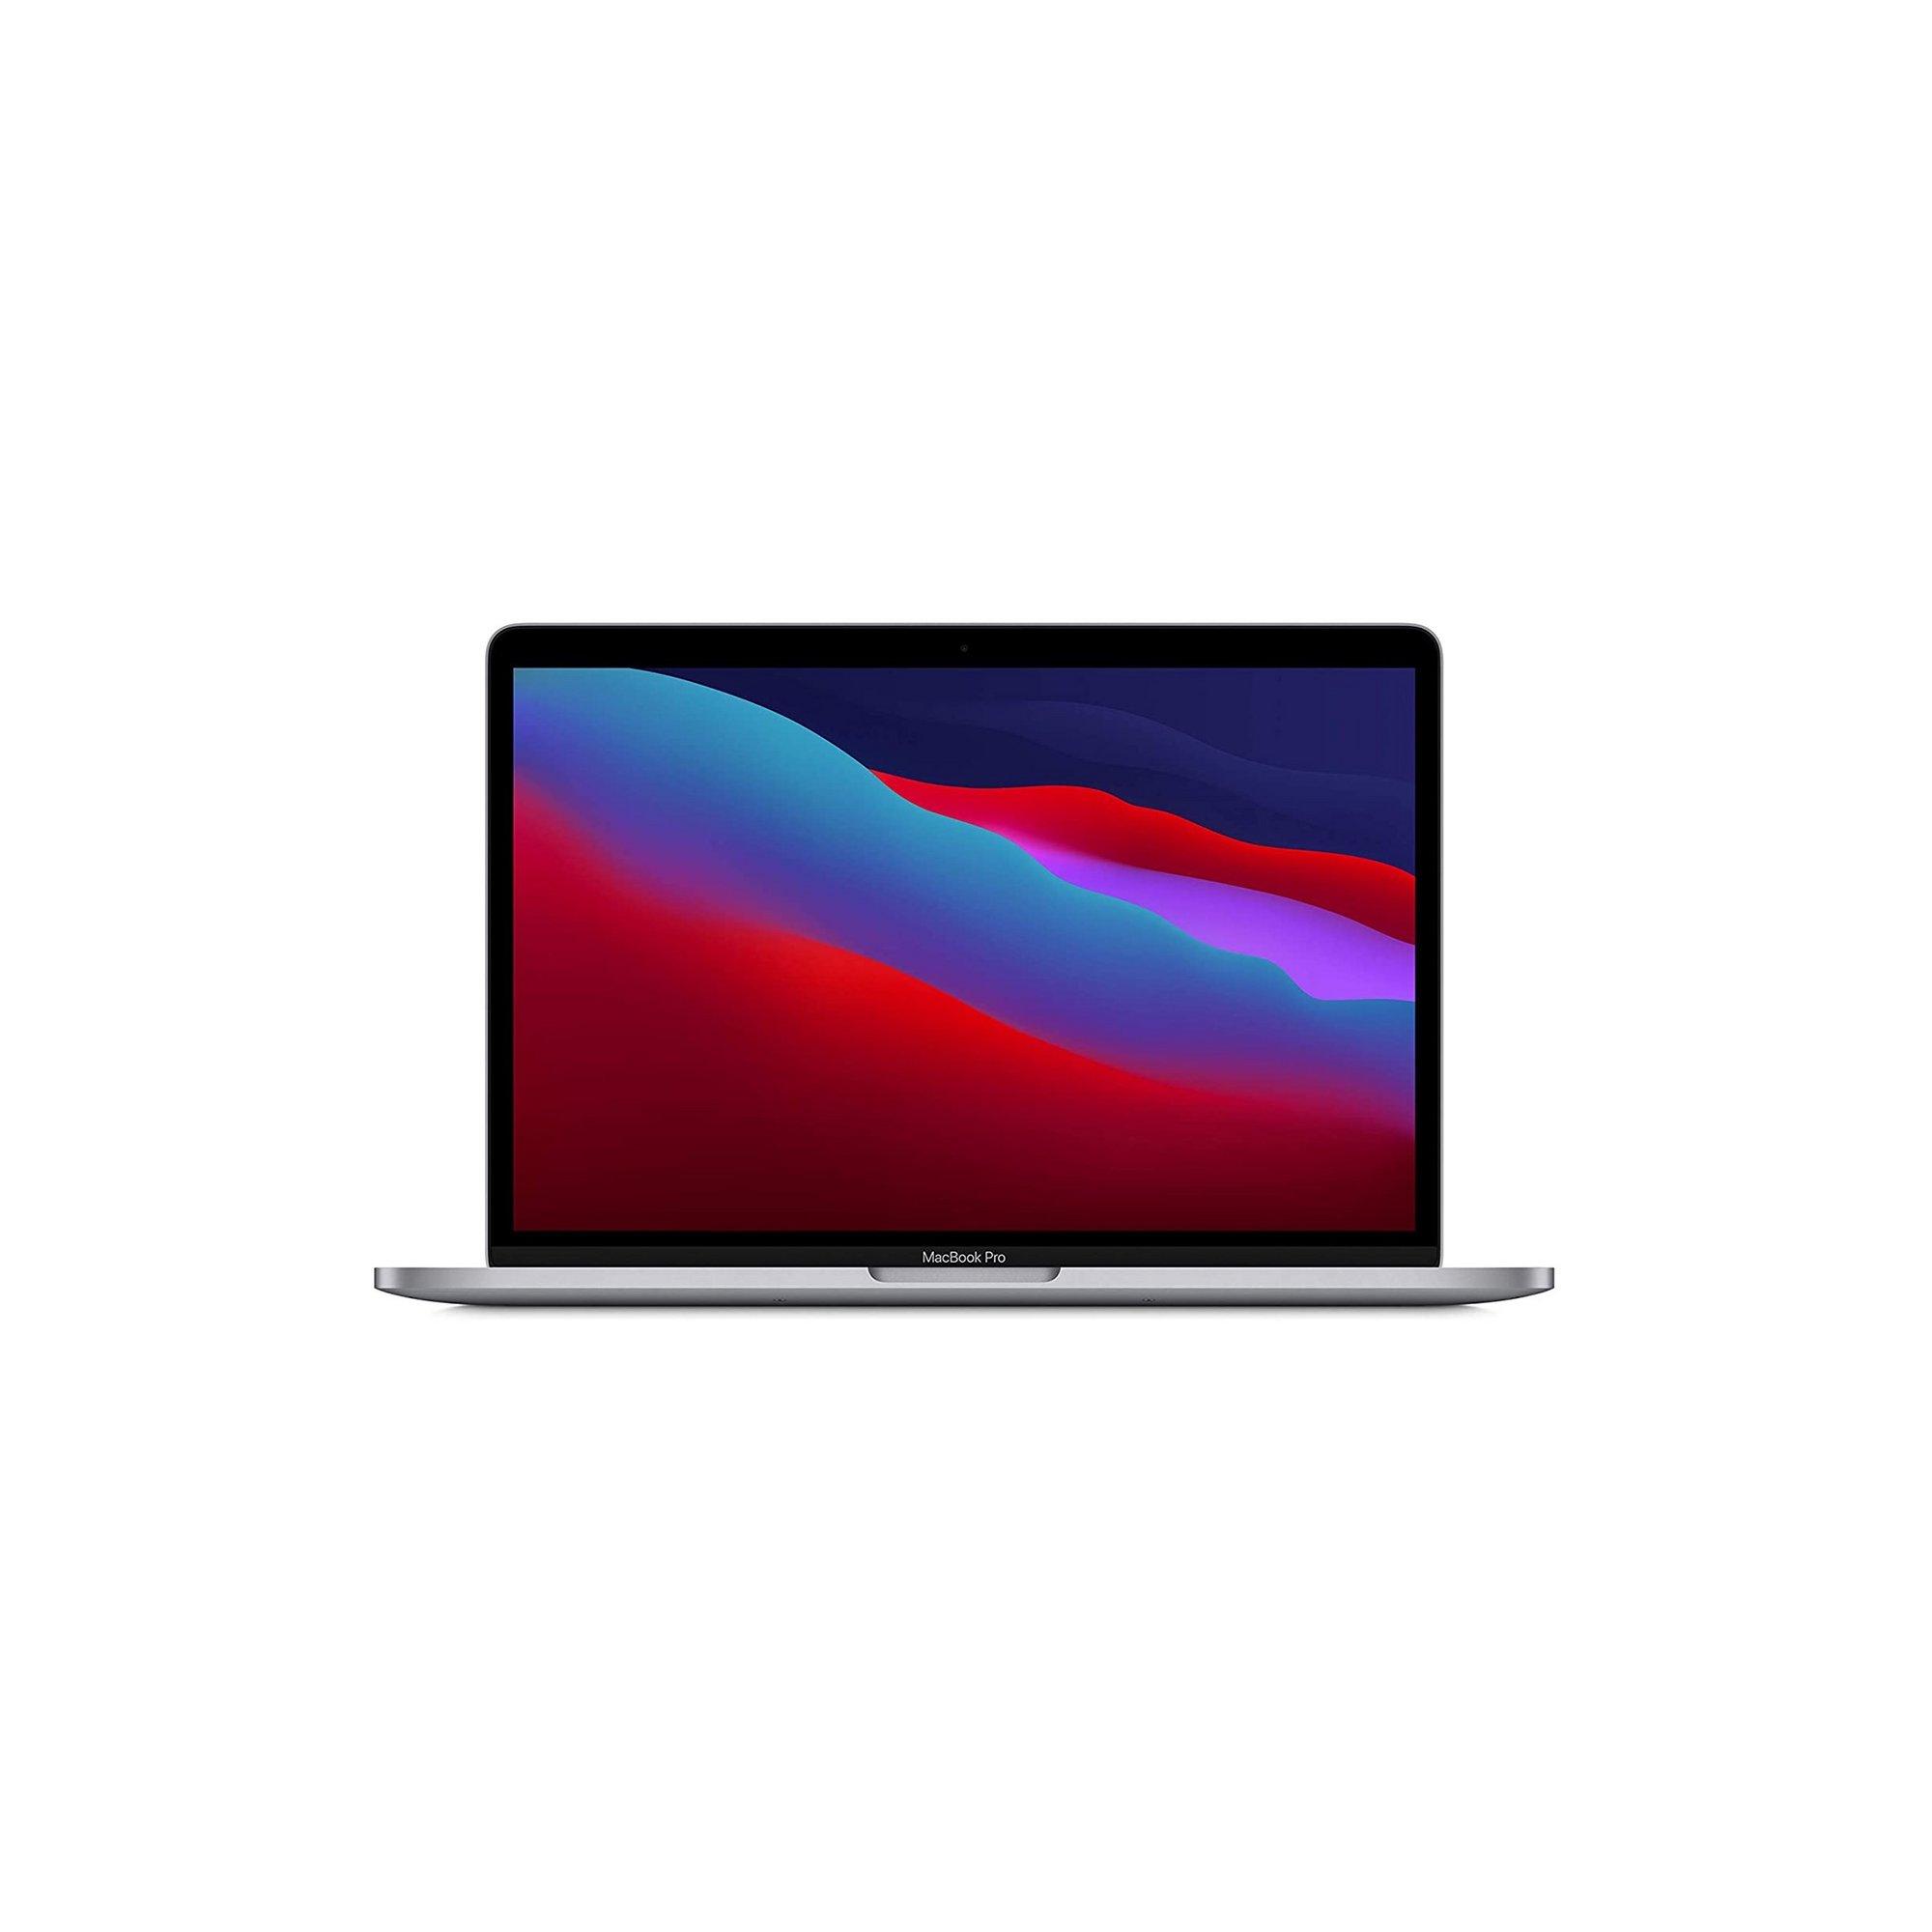 Image of Apple MacBook Pro 13 Inch M1 Chip 2020 512GB